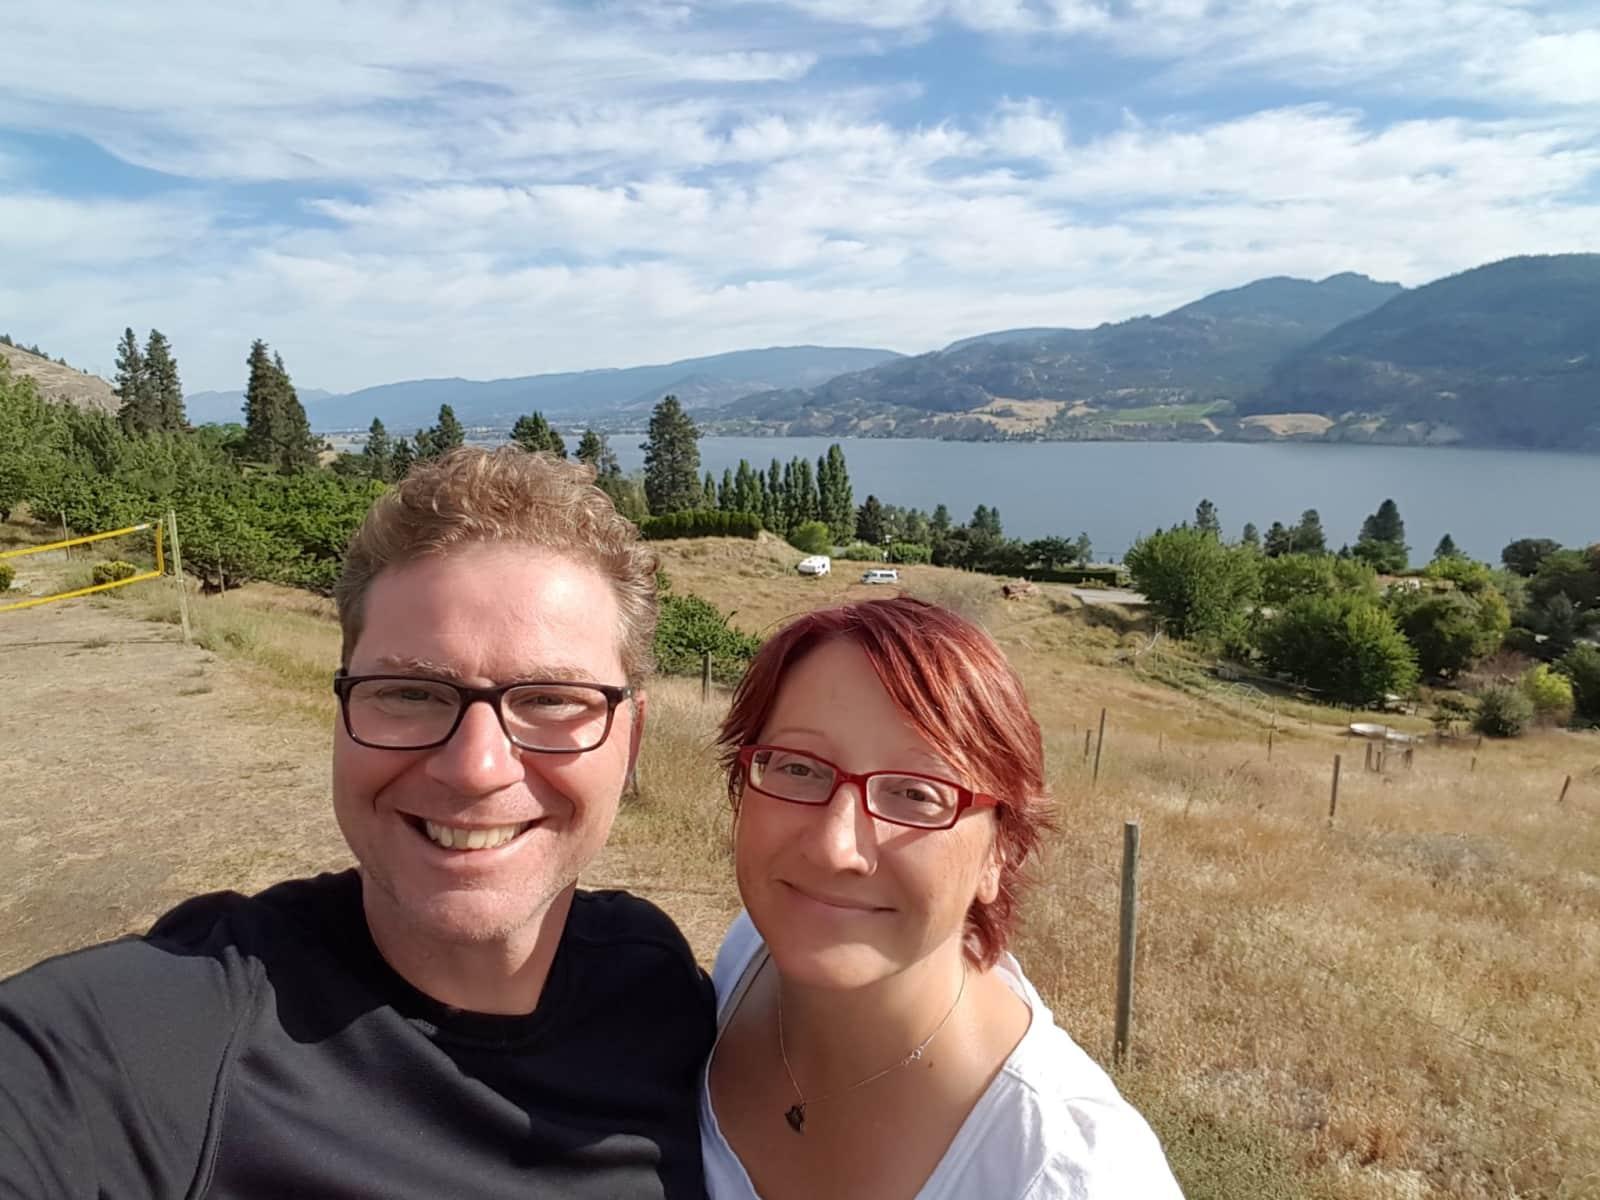 Rob & Sue from Canmore, Alberta, Canada